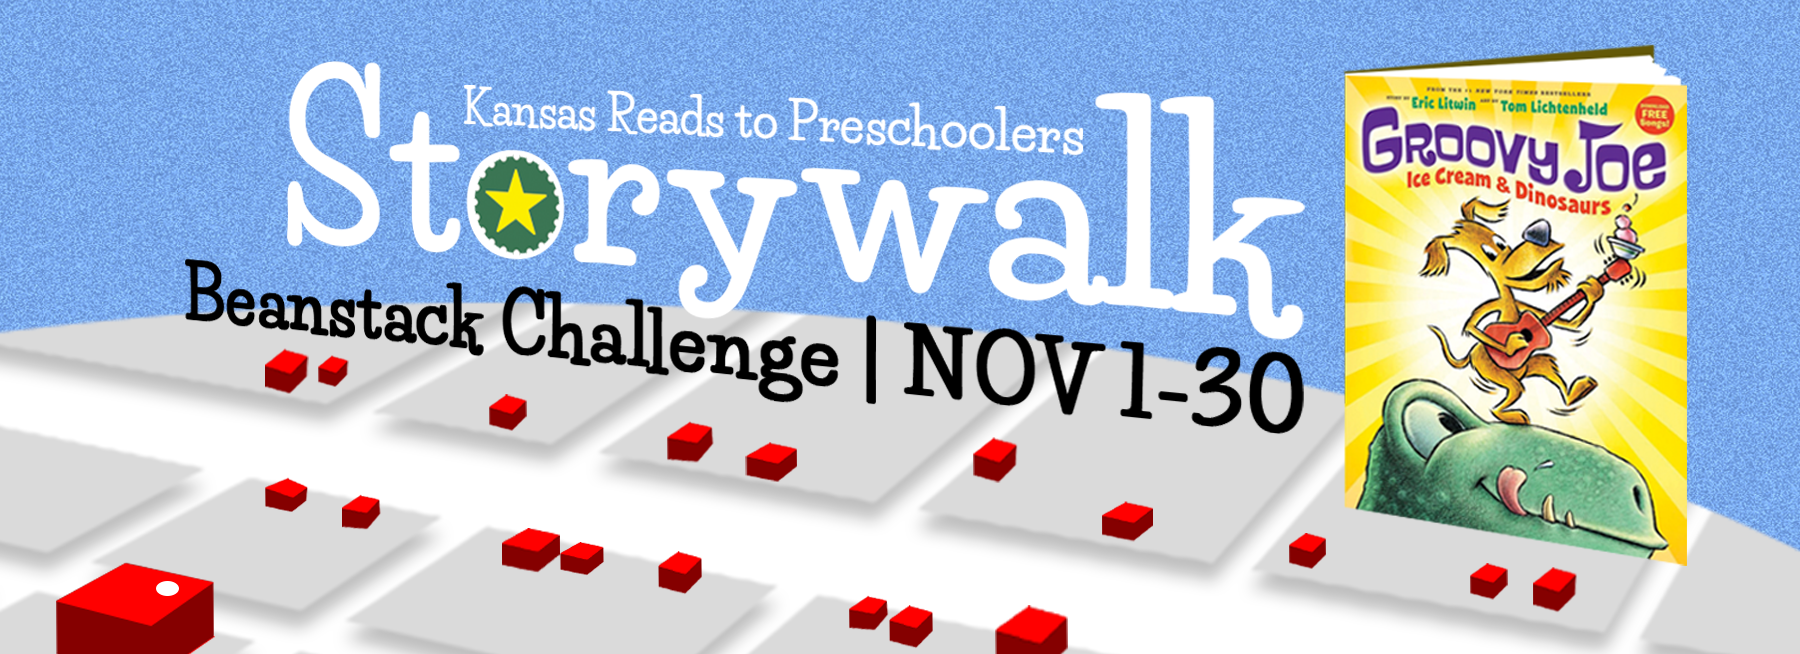 2020 10-28 Storywalk Beanstack Challenge